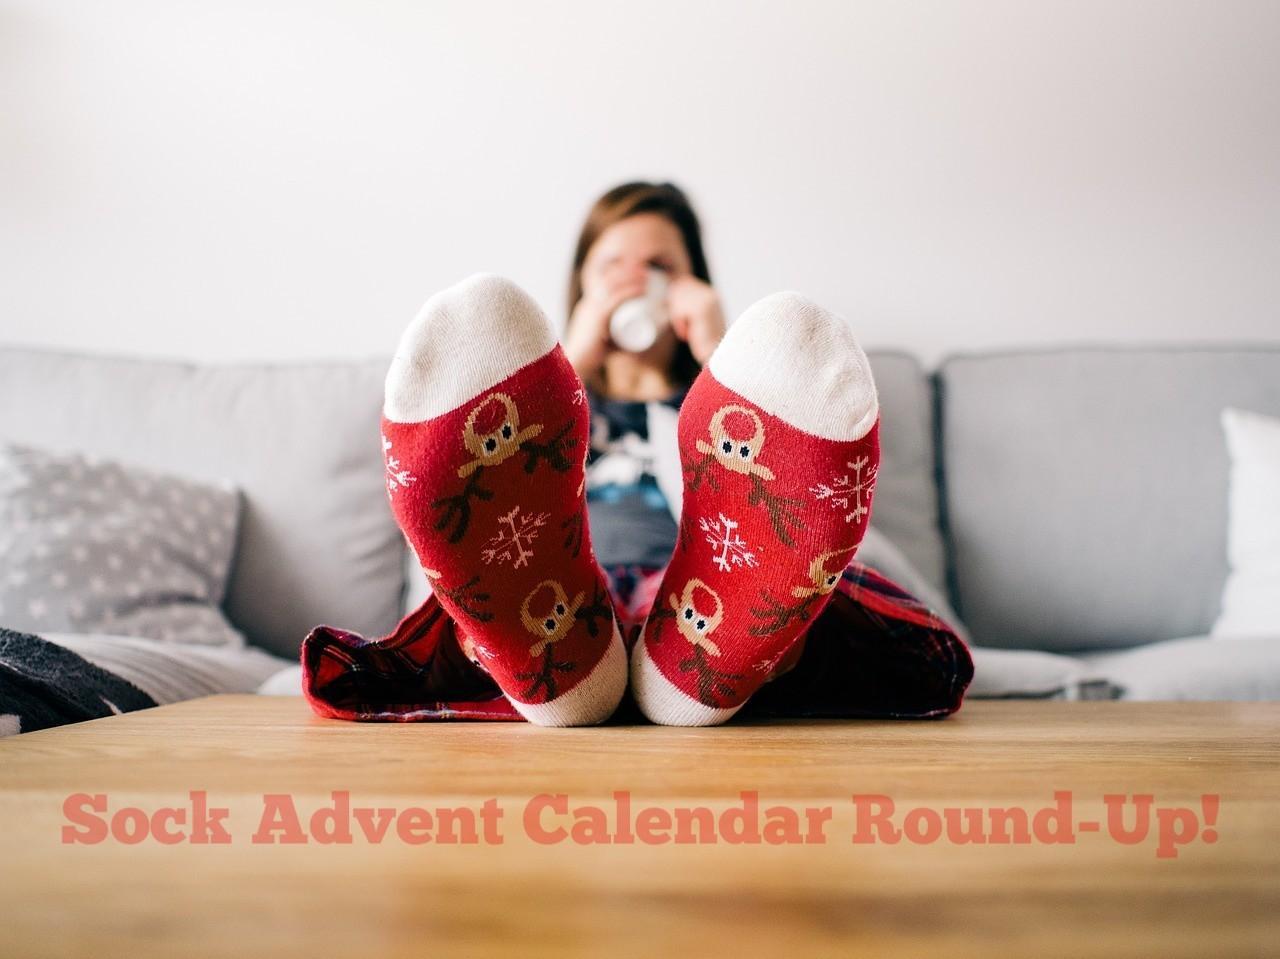 Sock Advent Calendar Round-Up!